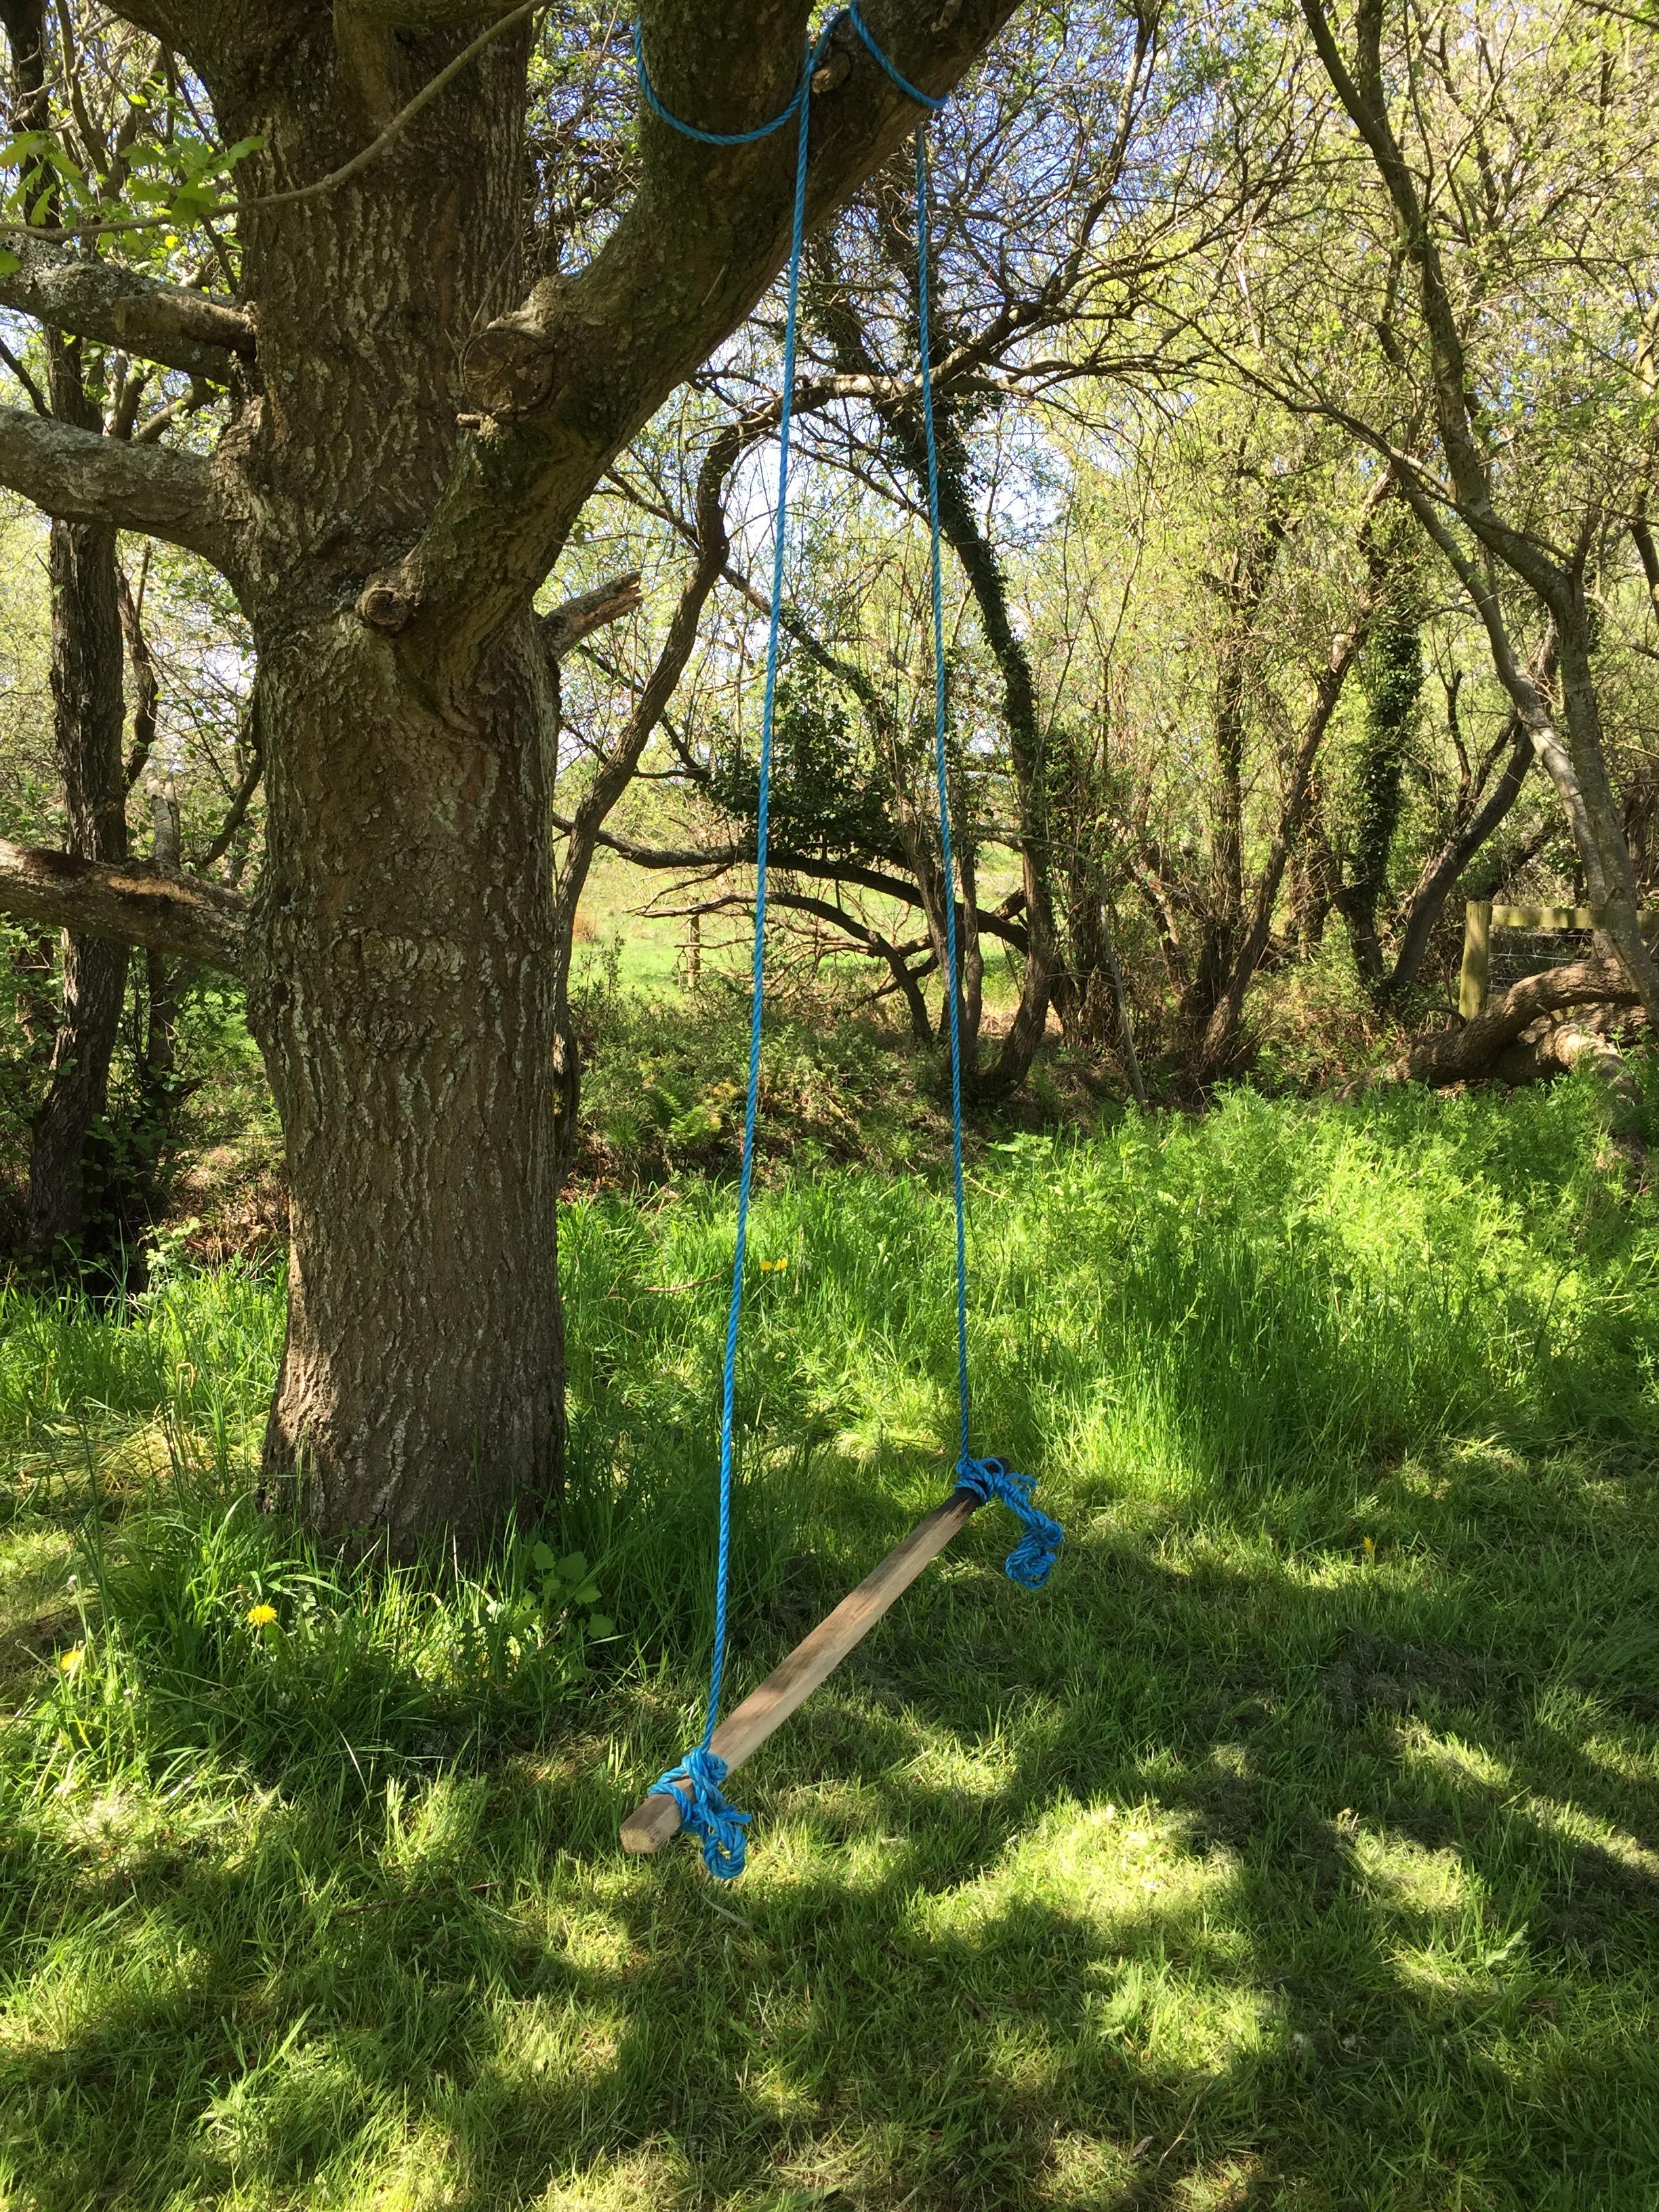 Camp hartland - rope swing.jpg